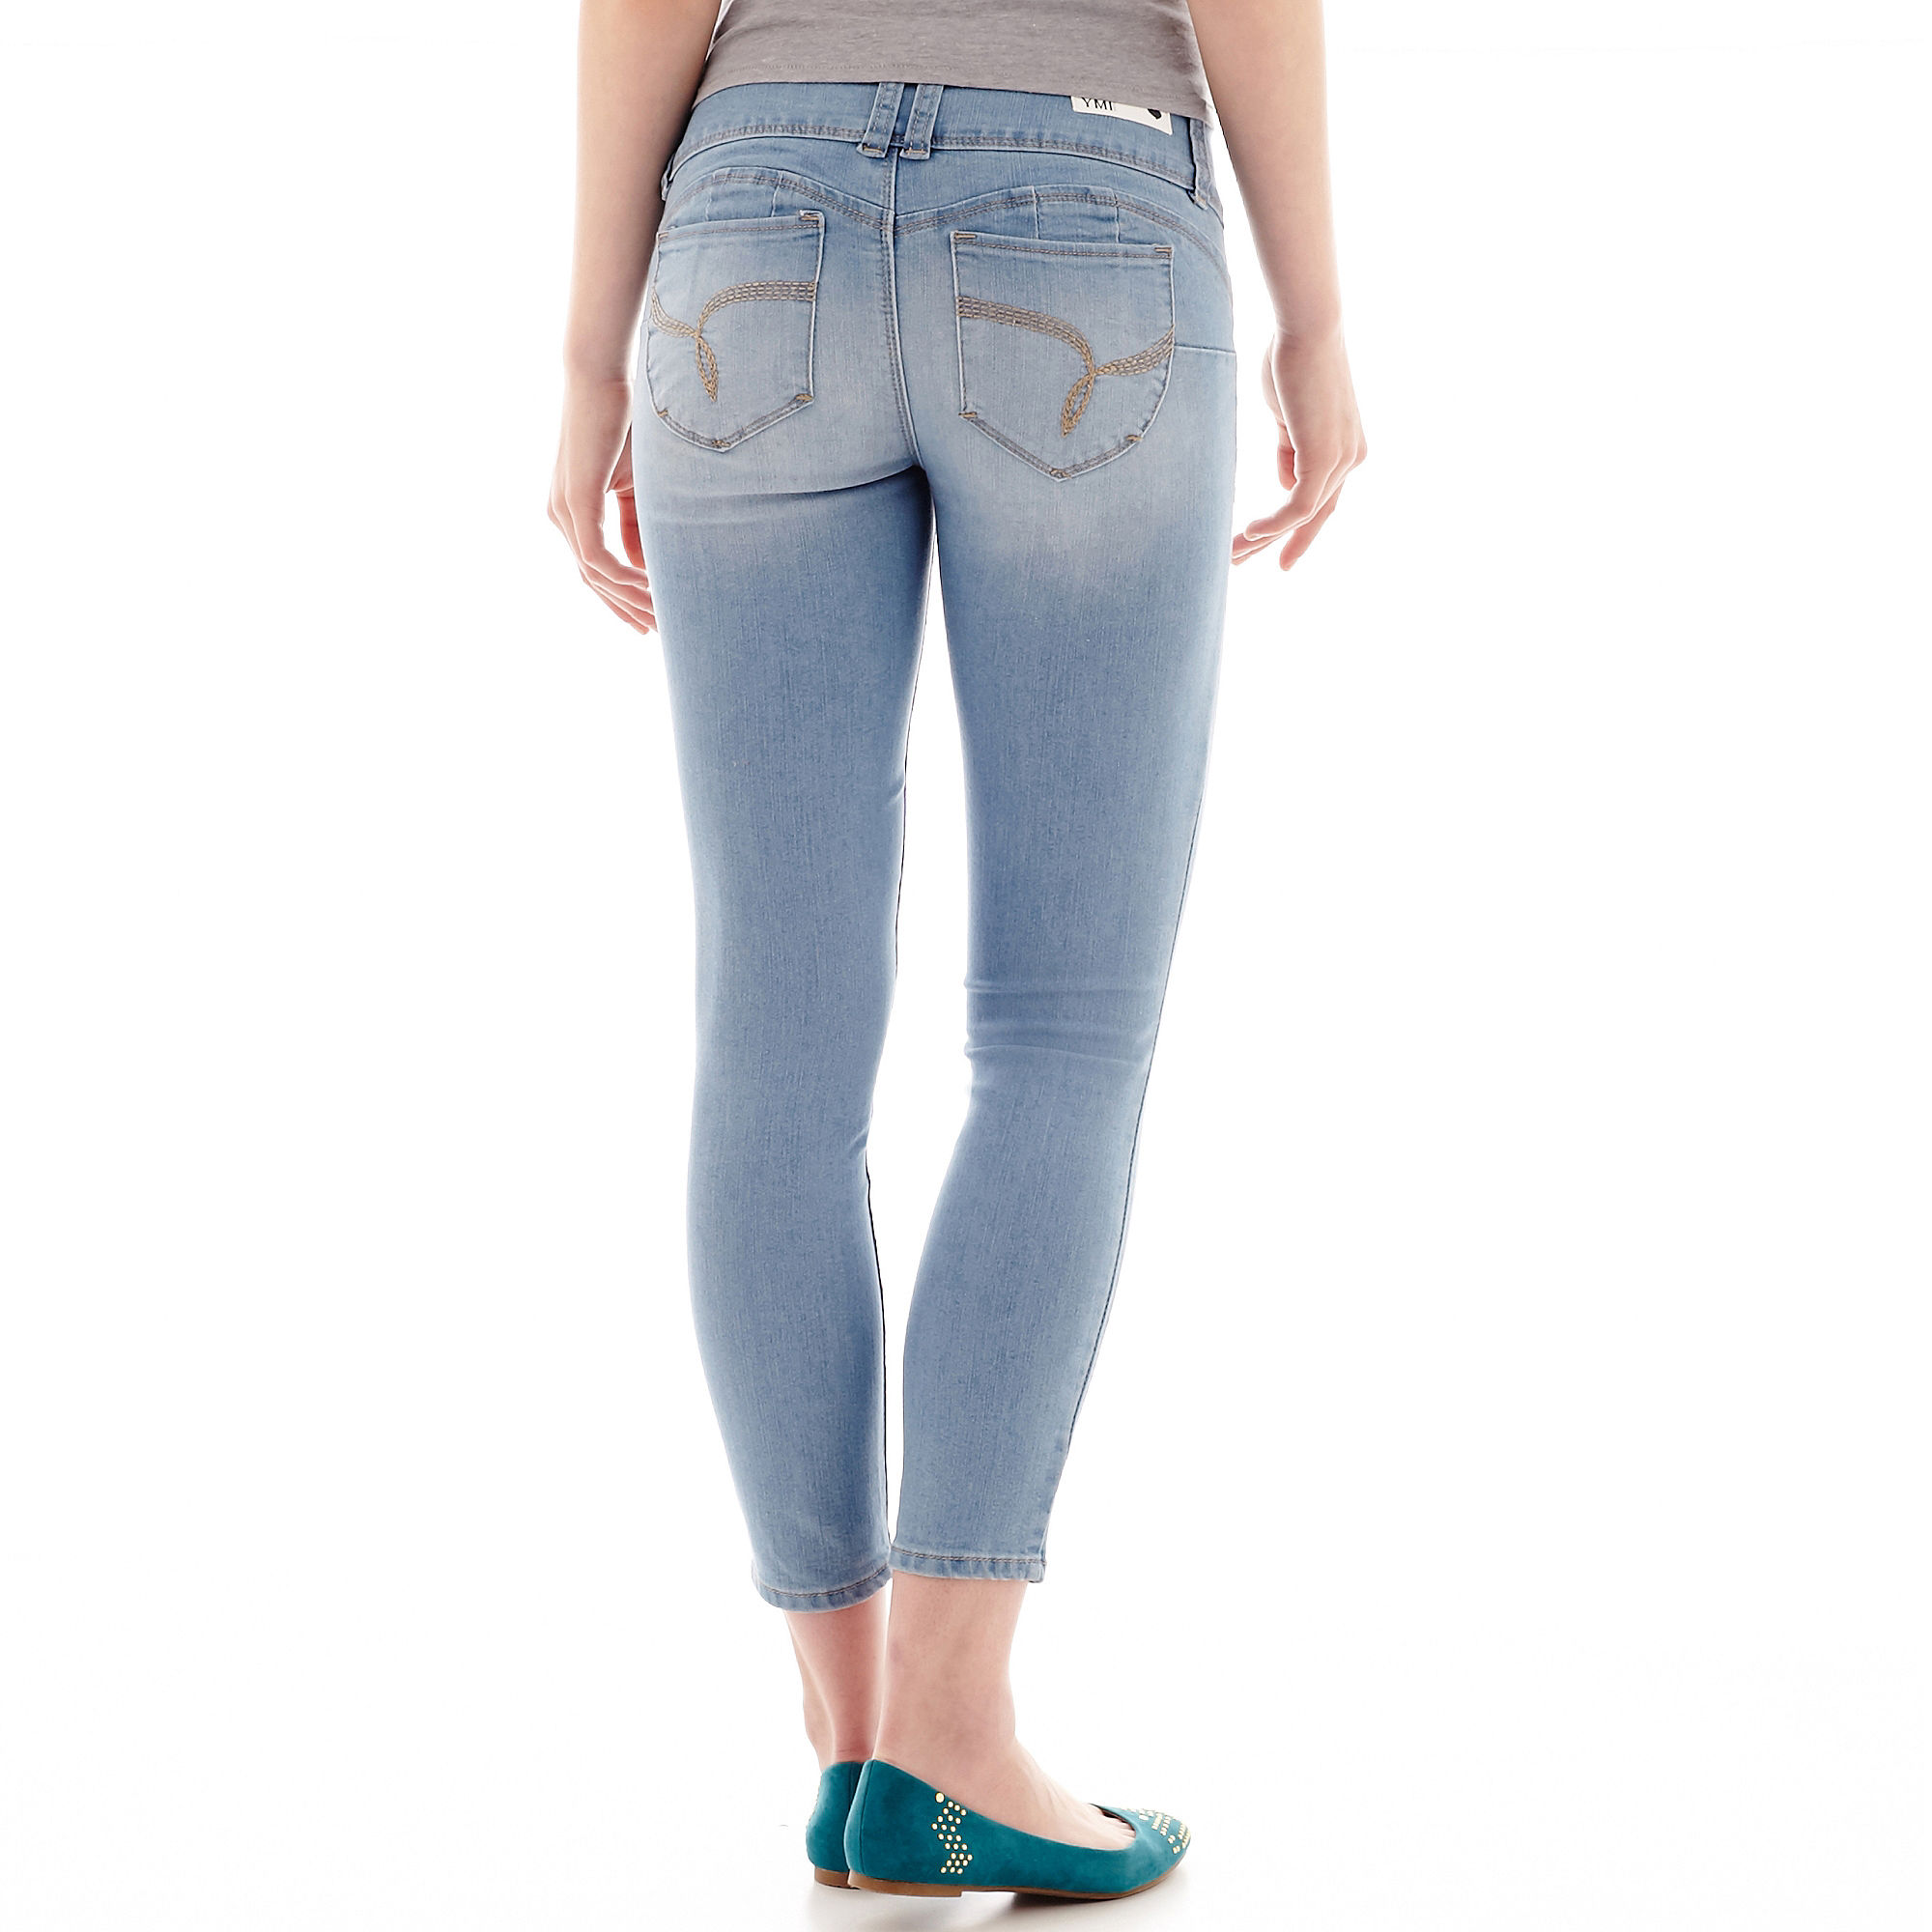 YMI Wanna Betta Butt Denim Cropped Jeans